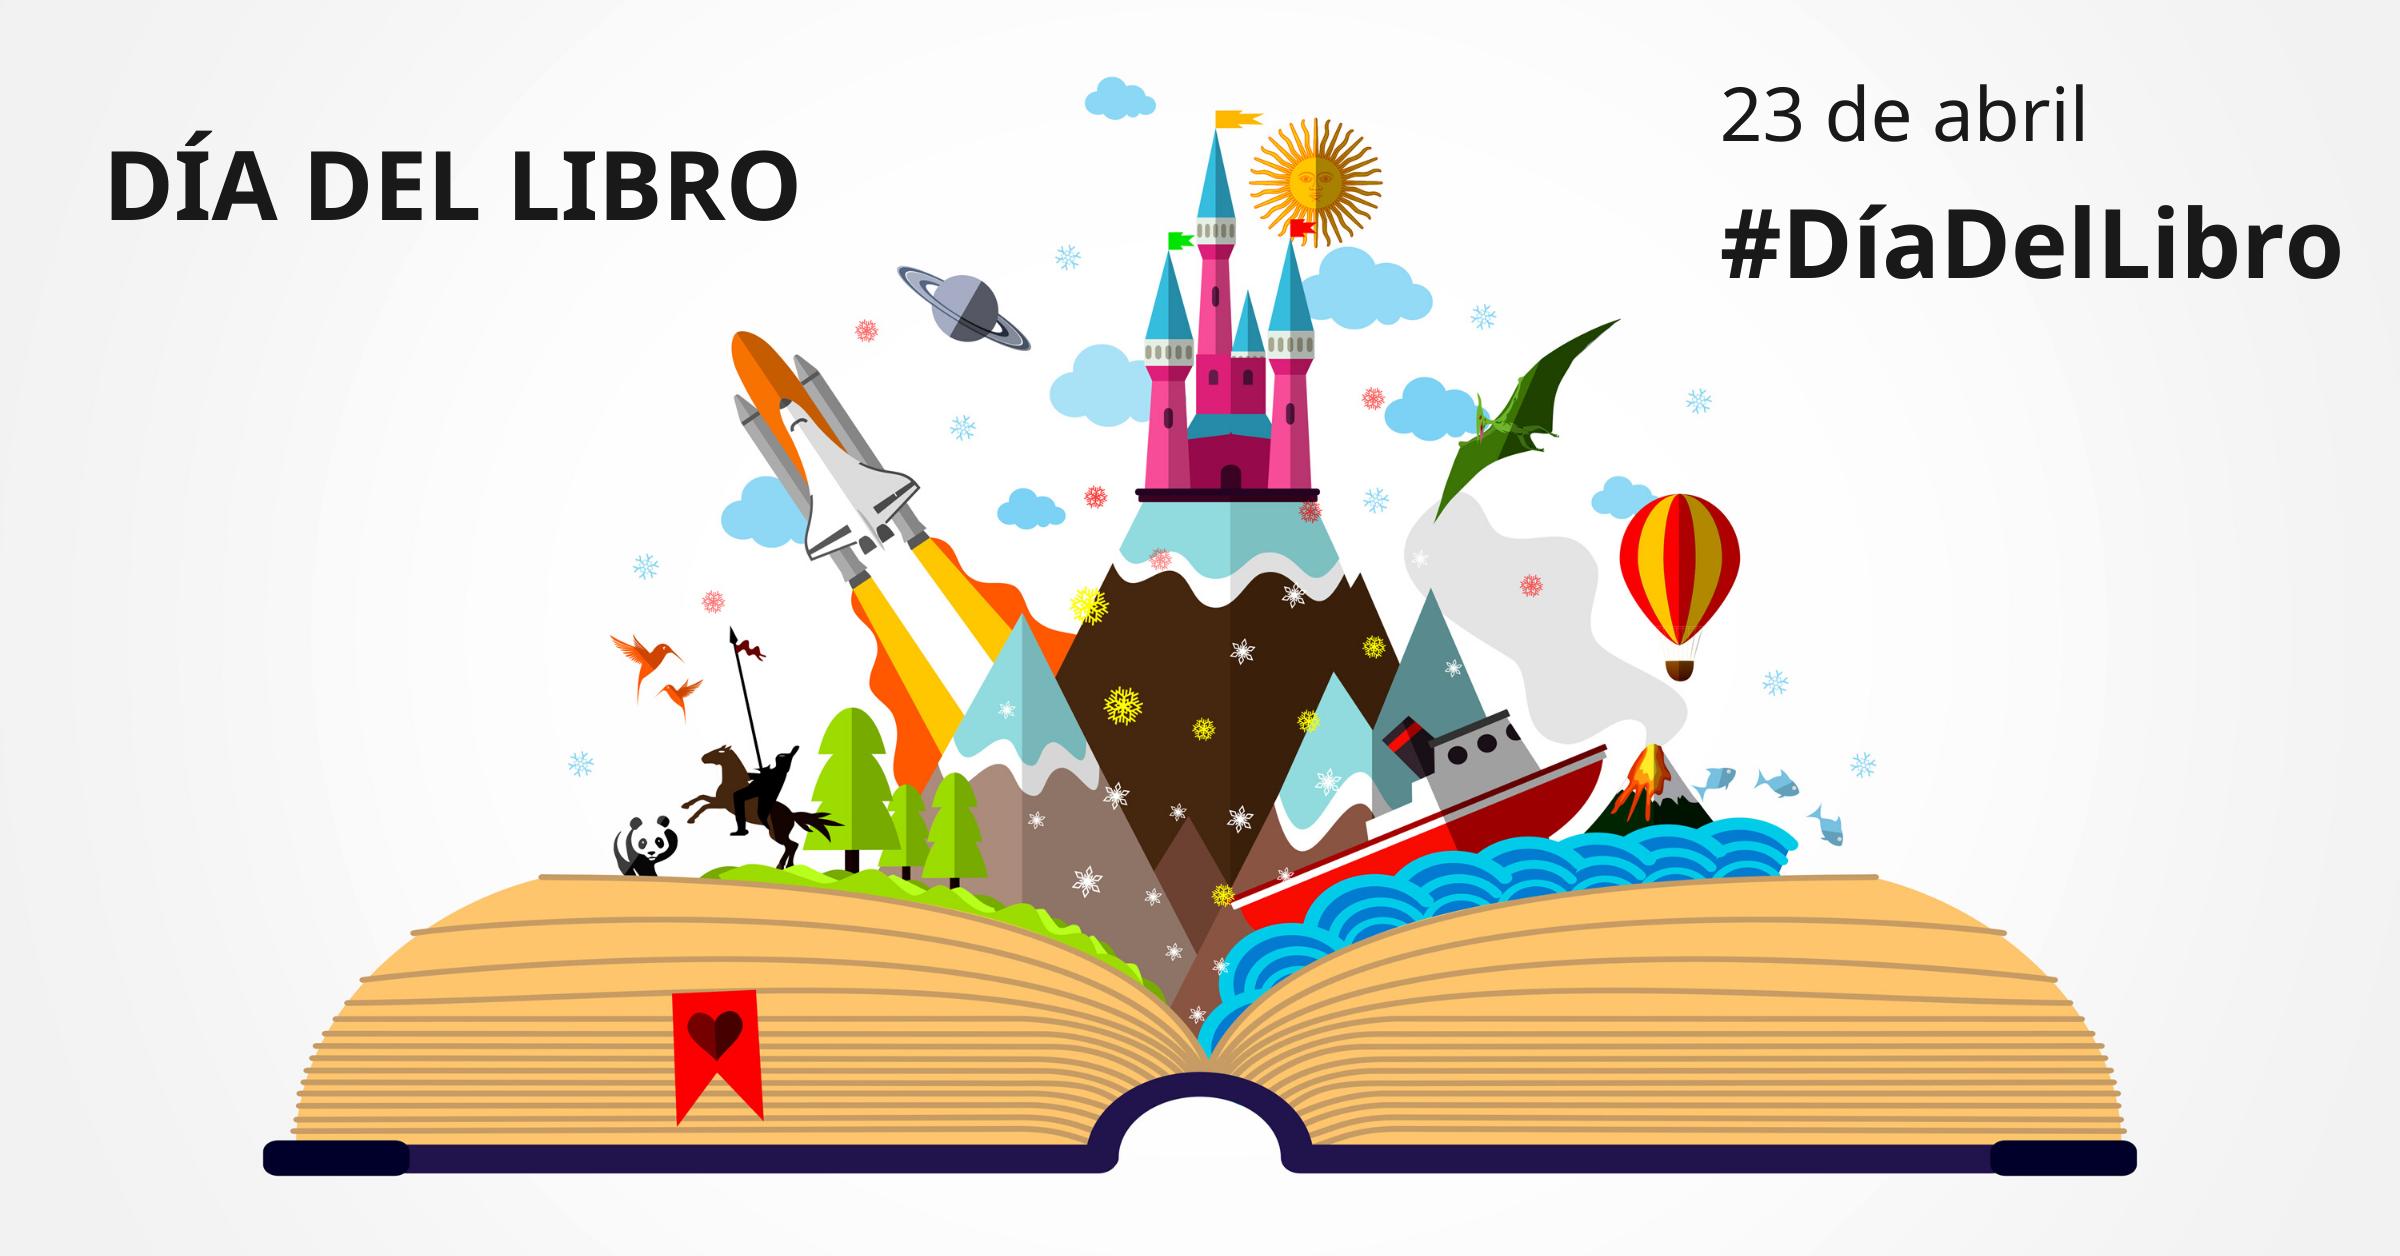 es-dia-del-libro-23-de-abril-stockvault-story-book-childhood-imagination-concept182254